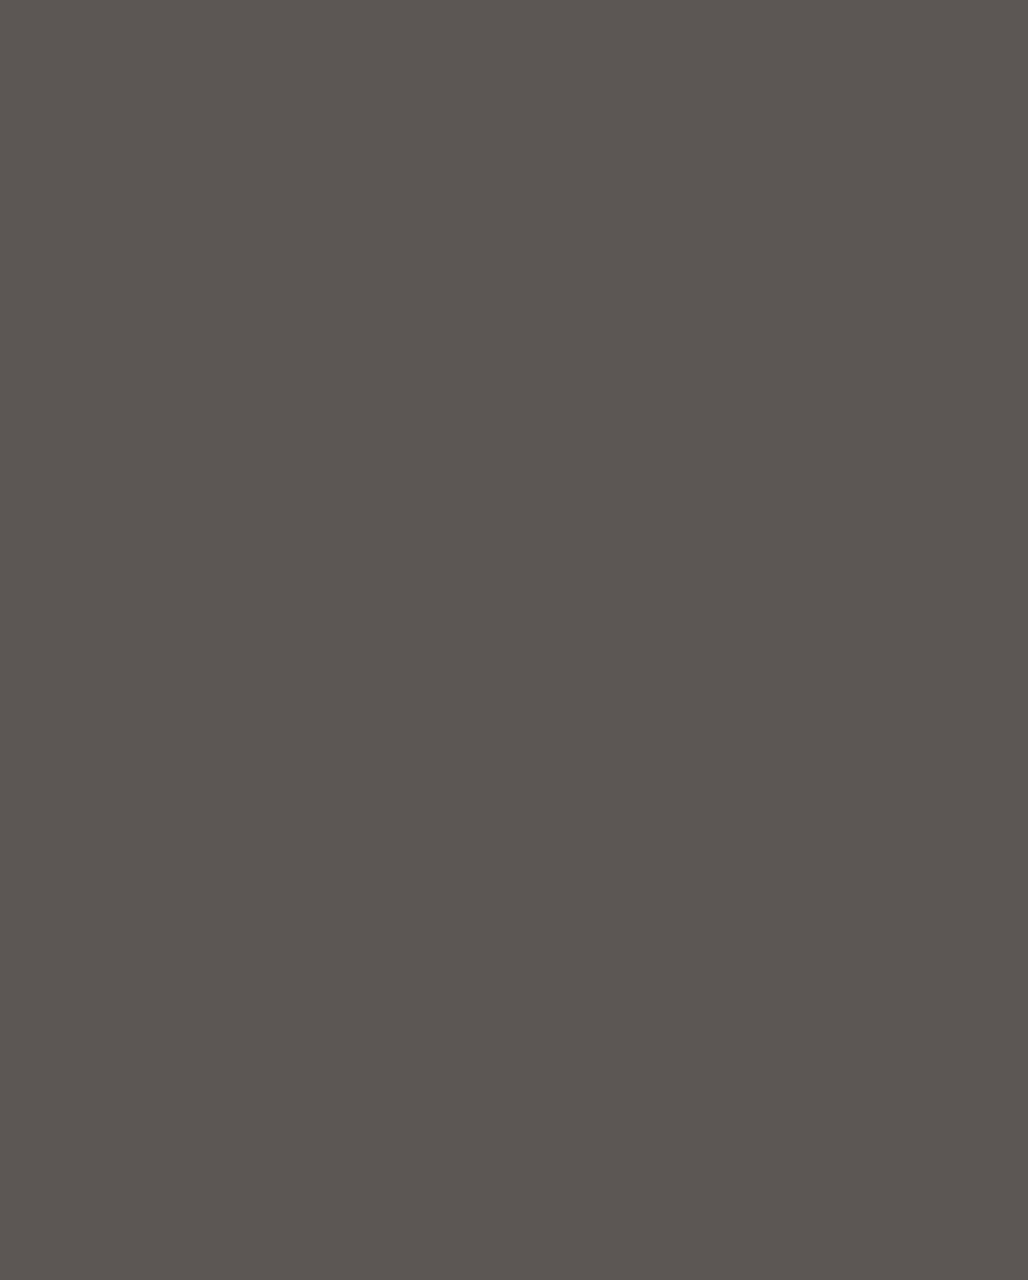 6299 Cobalt Grey (MF PB sample)